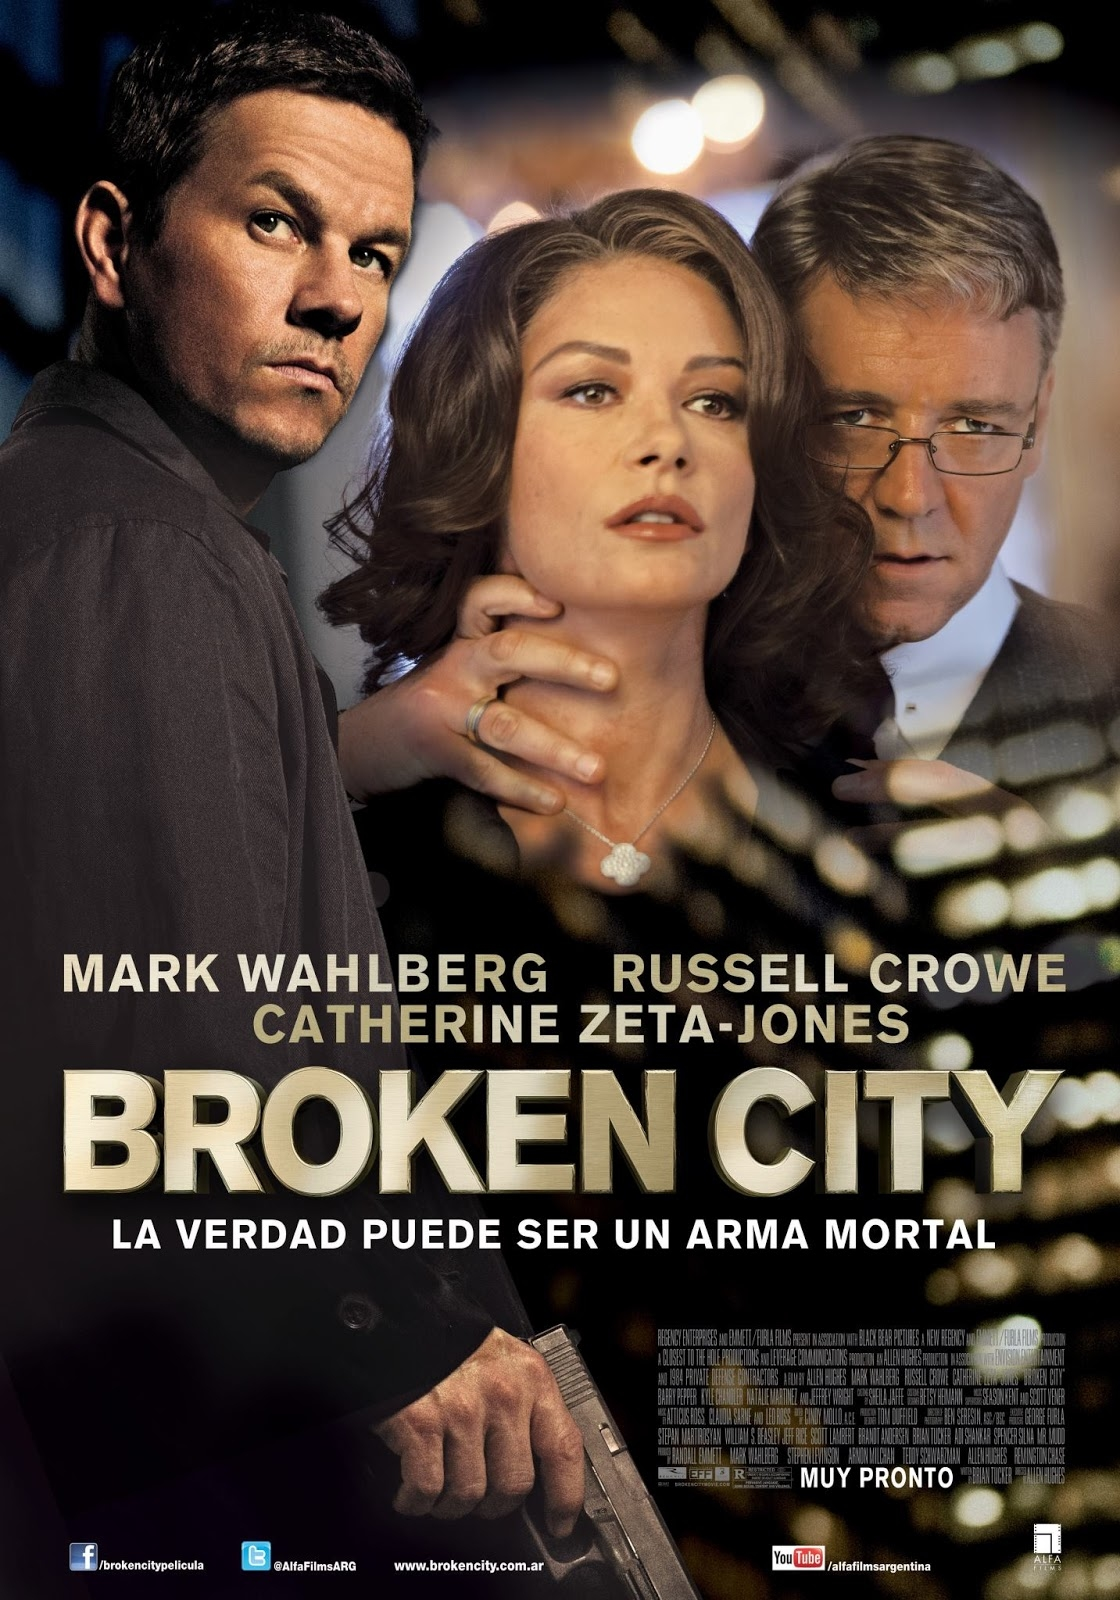 Broken City - Movie Poster #2 (Original)